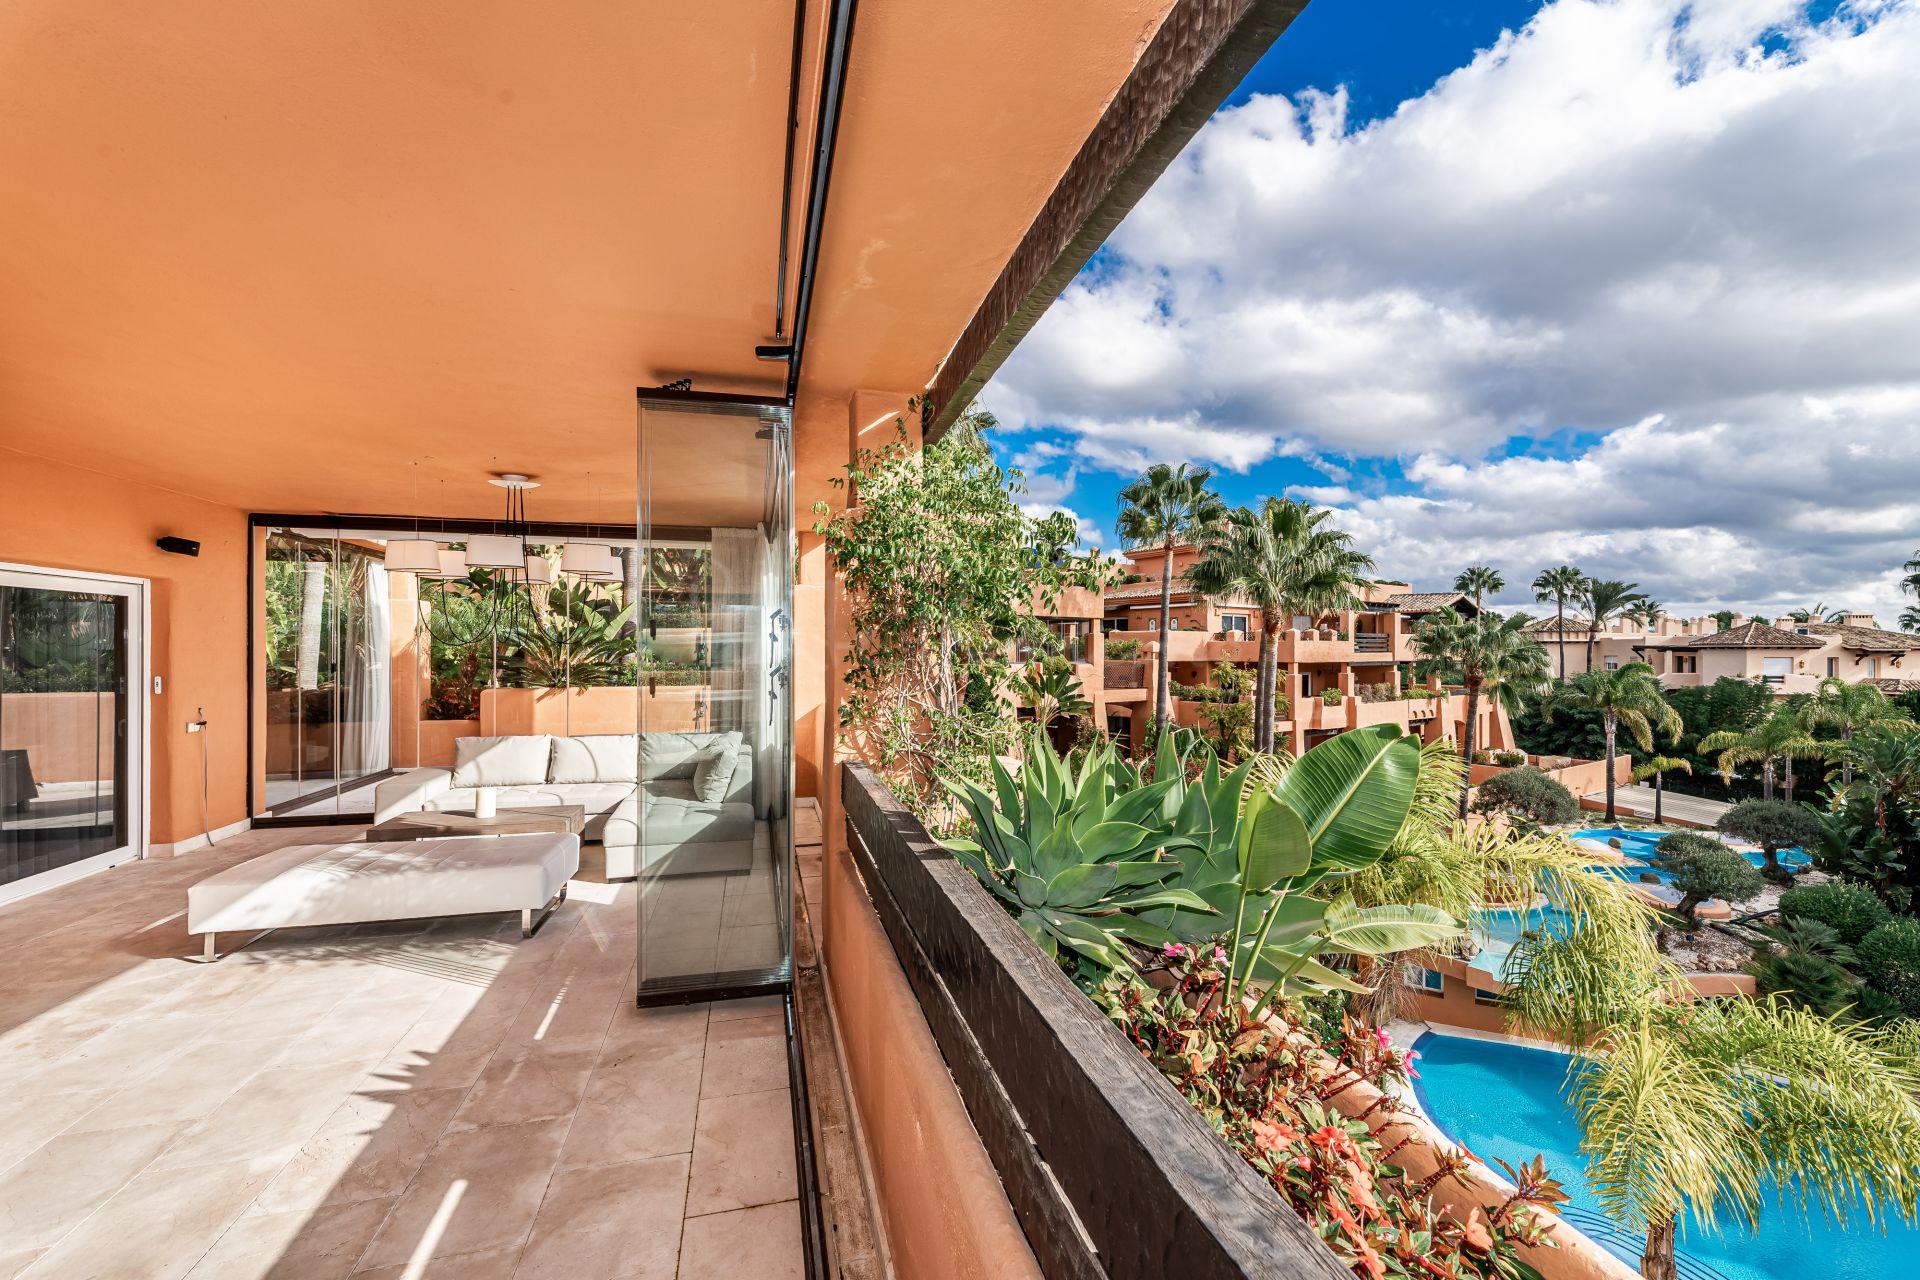 Apartment in Lagos de Sierra Blanca, Marbella